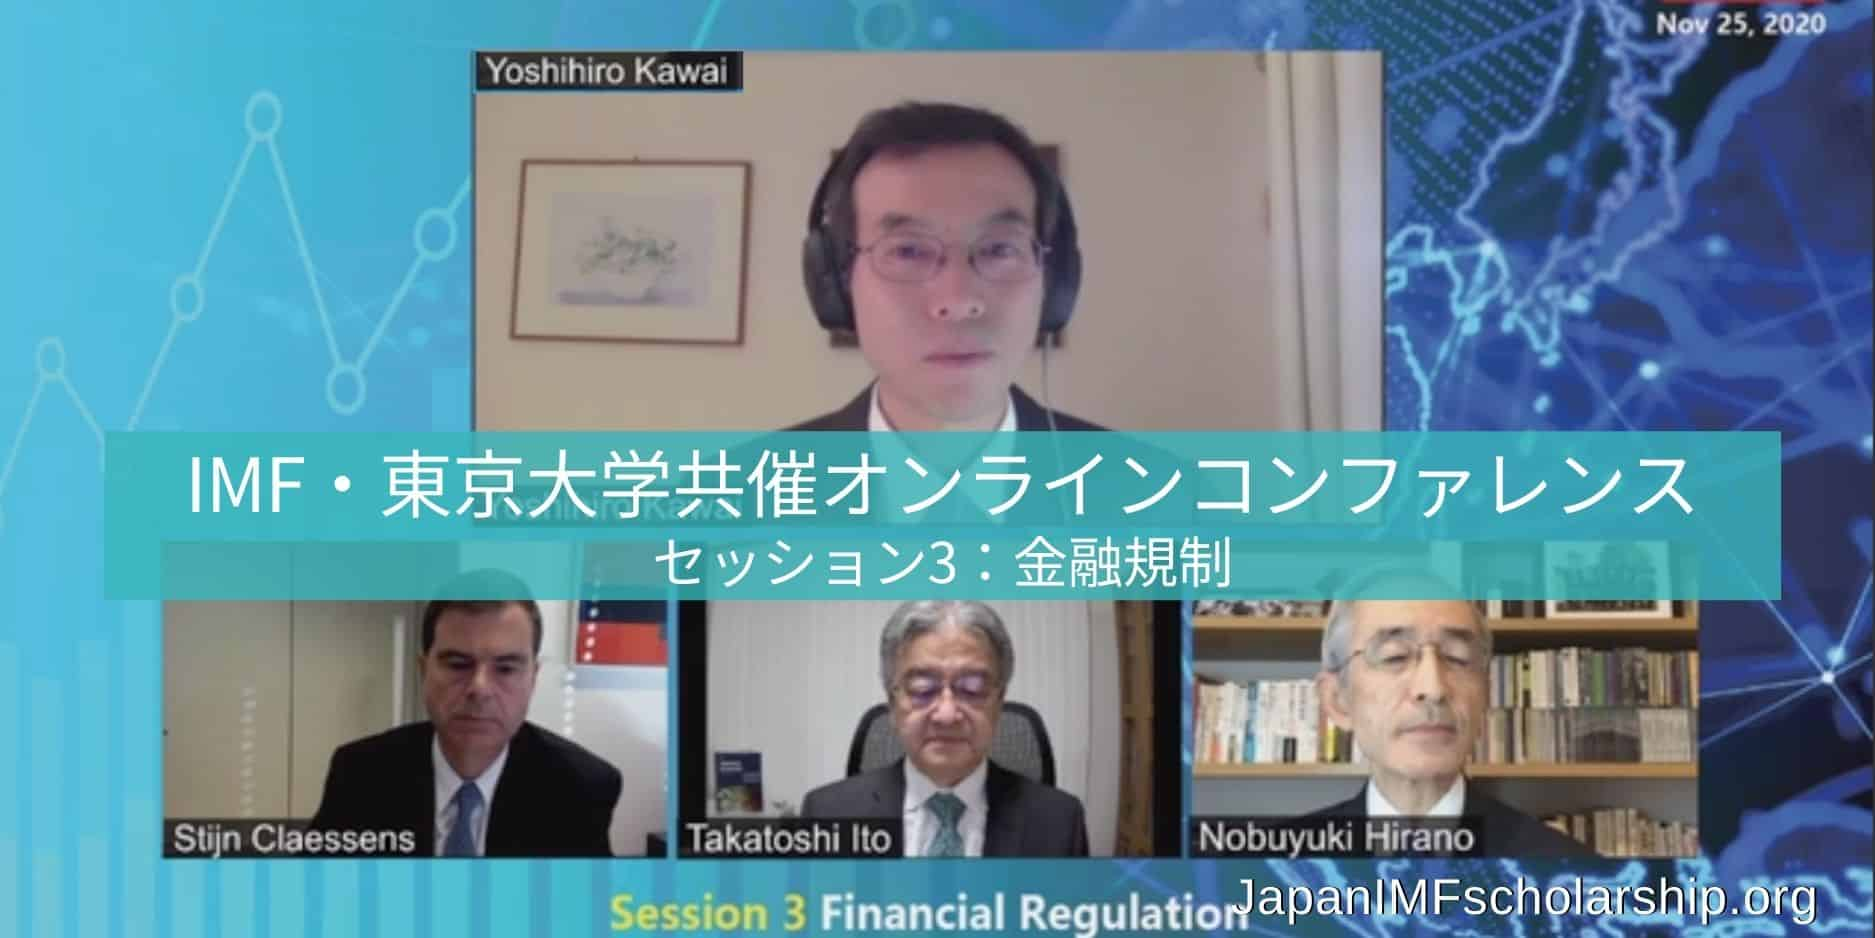 jisp web-fb imf-the university of tokyo virtual conference session 3